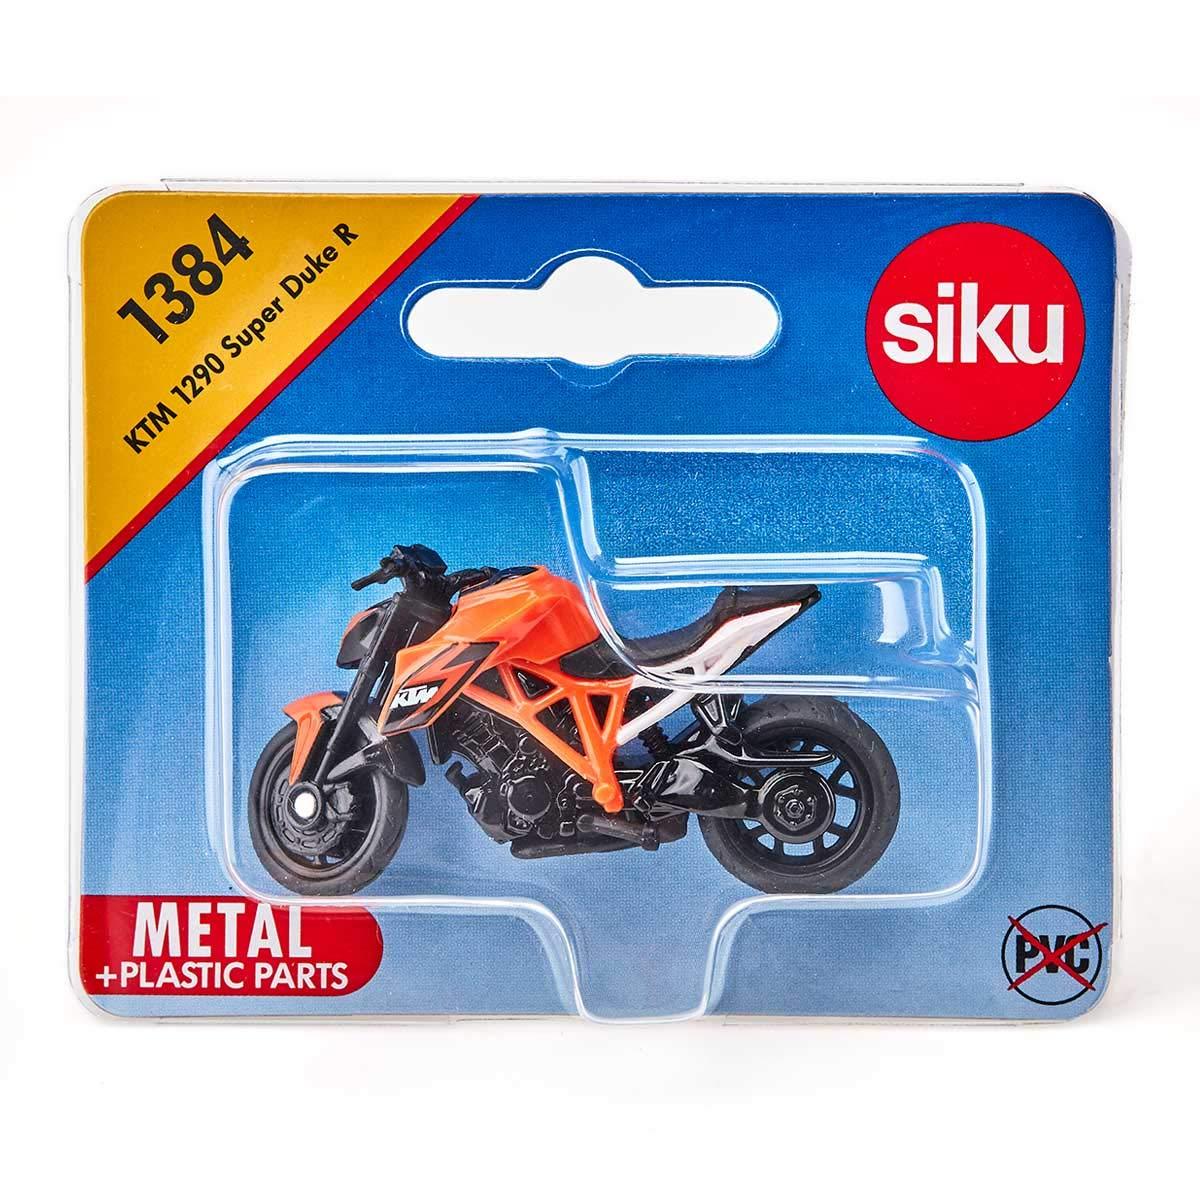 SIKU 1384 KTM 1290 Super Duke R